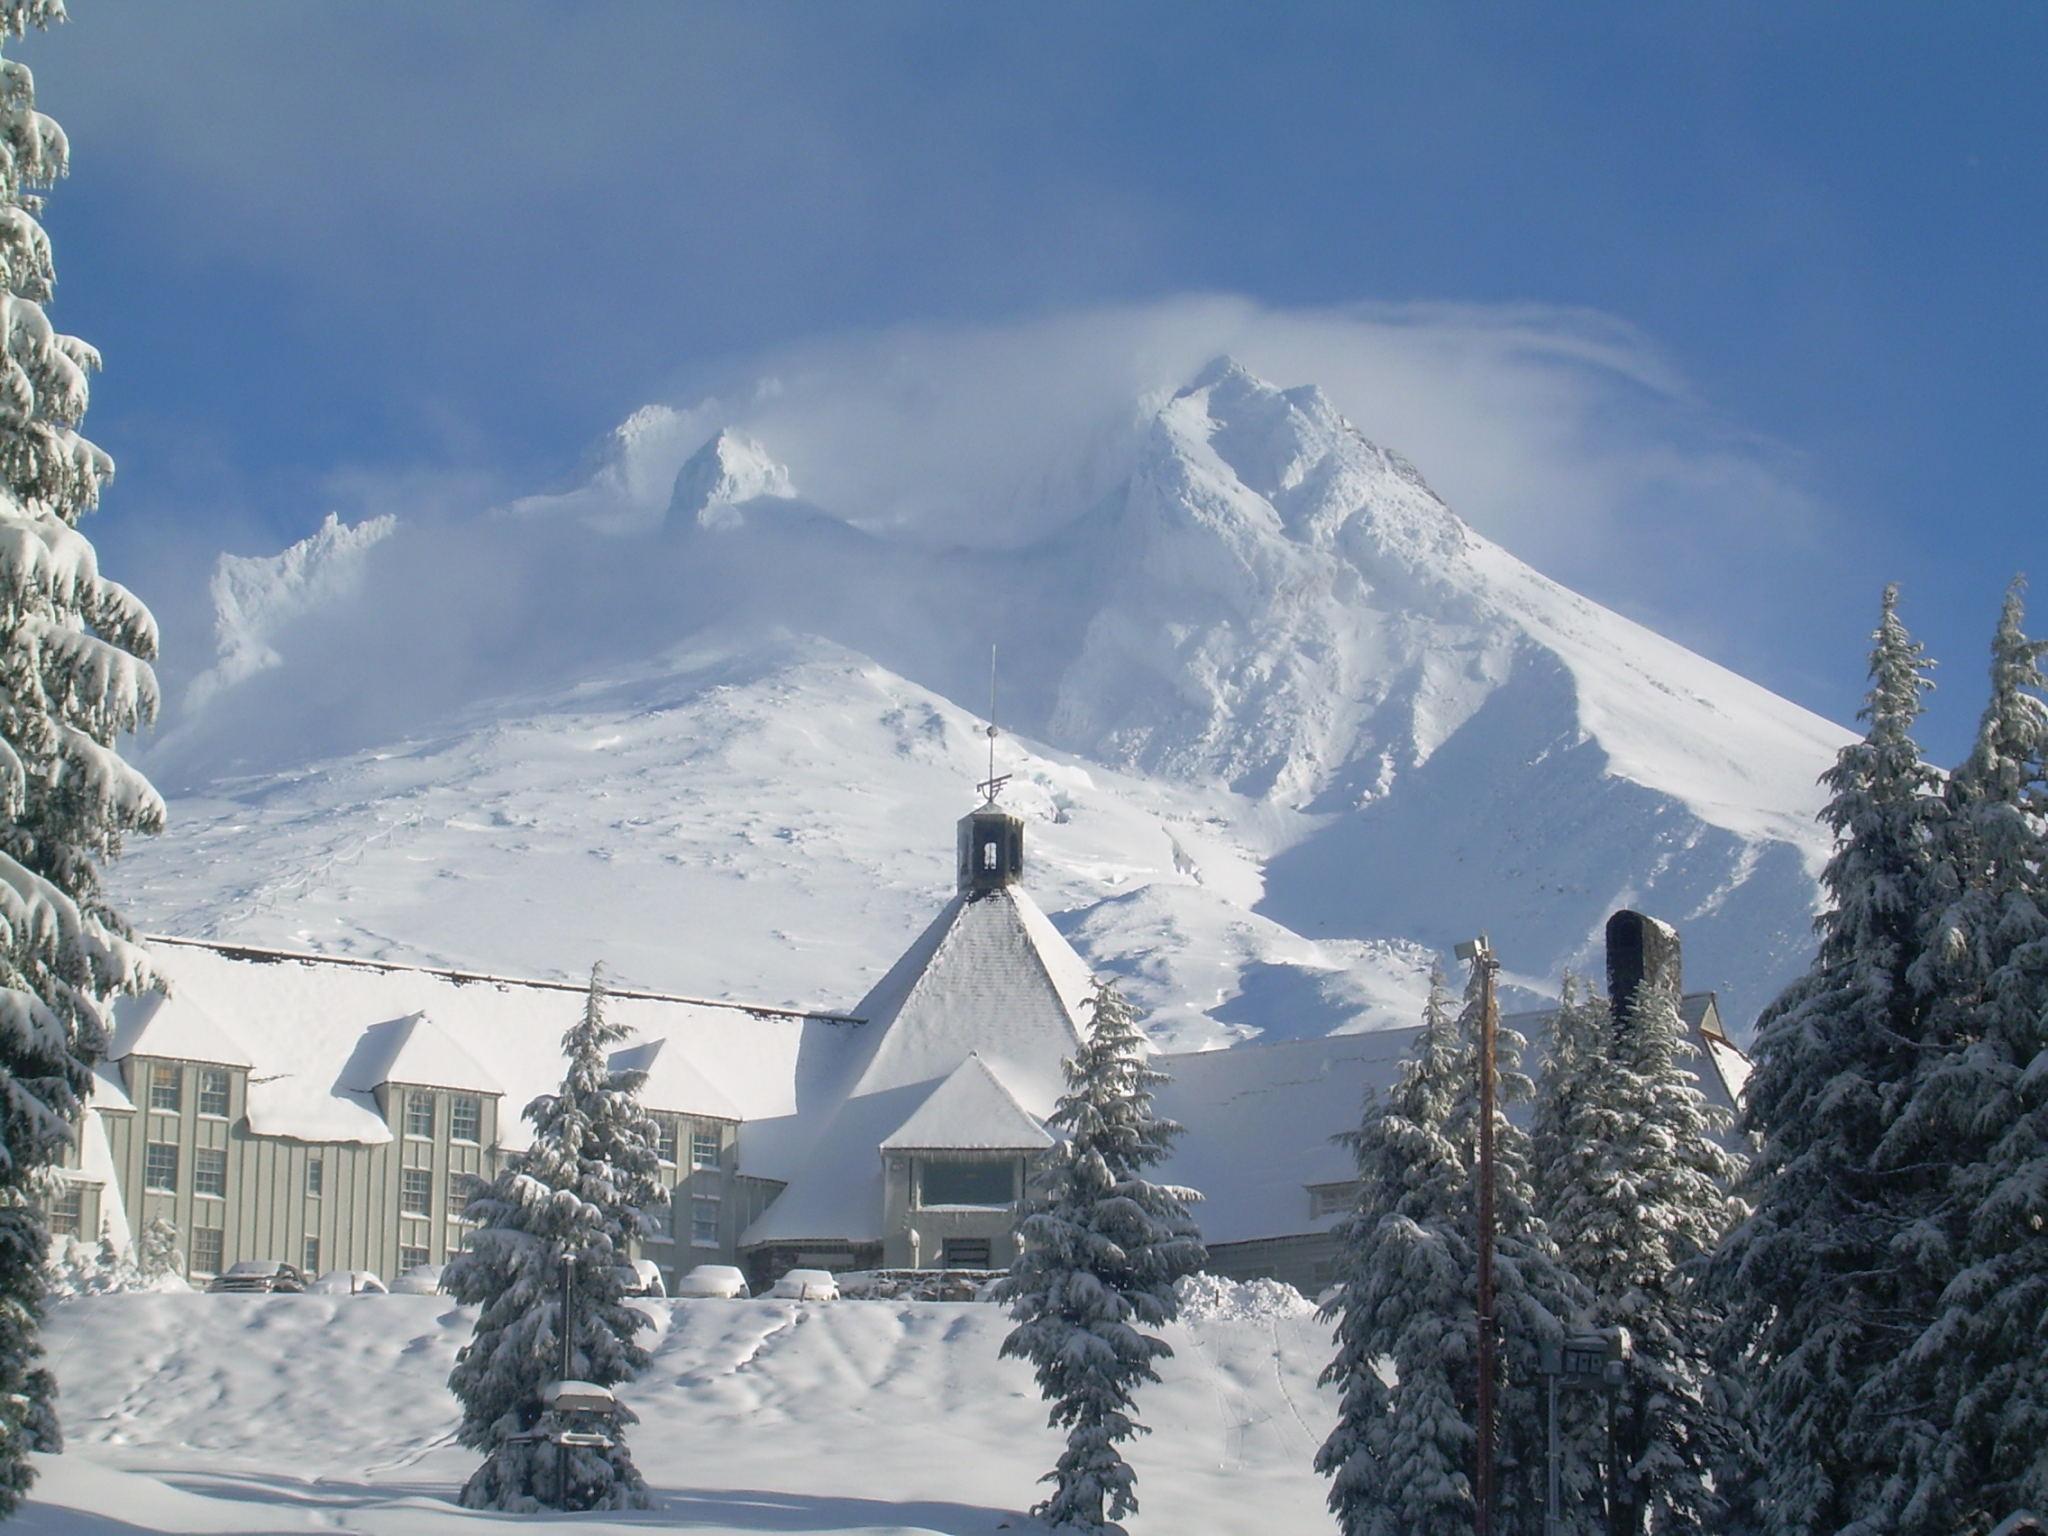 Timberline Οδηγός Χιονοδρομικού Κέντρου